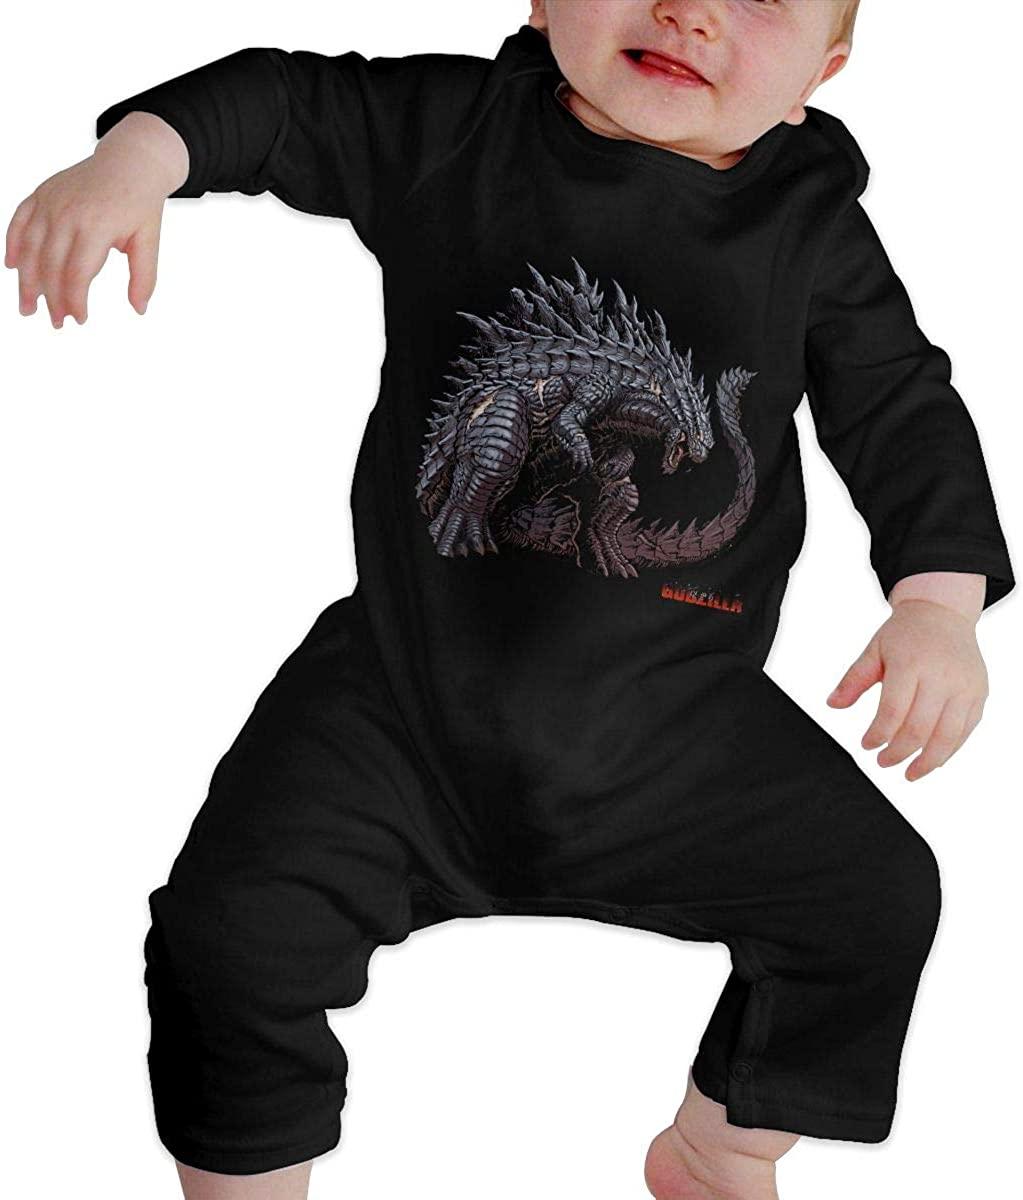 Watkinsmarket God-Zilla Baby Boy Girl Jumpsuit Jumpsuit Baby Newborn Cotton Long Sleeve Jumpsuit Black